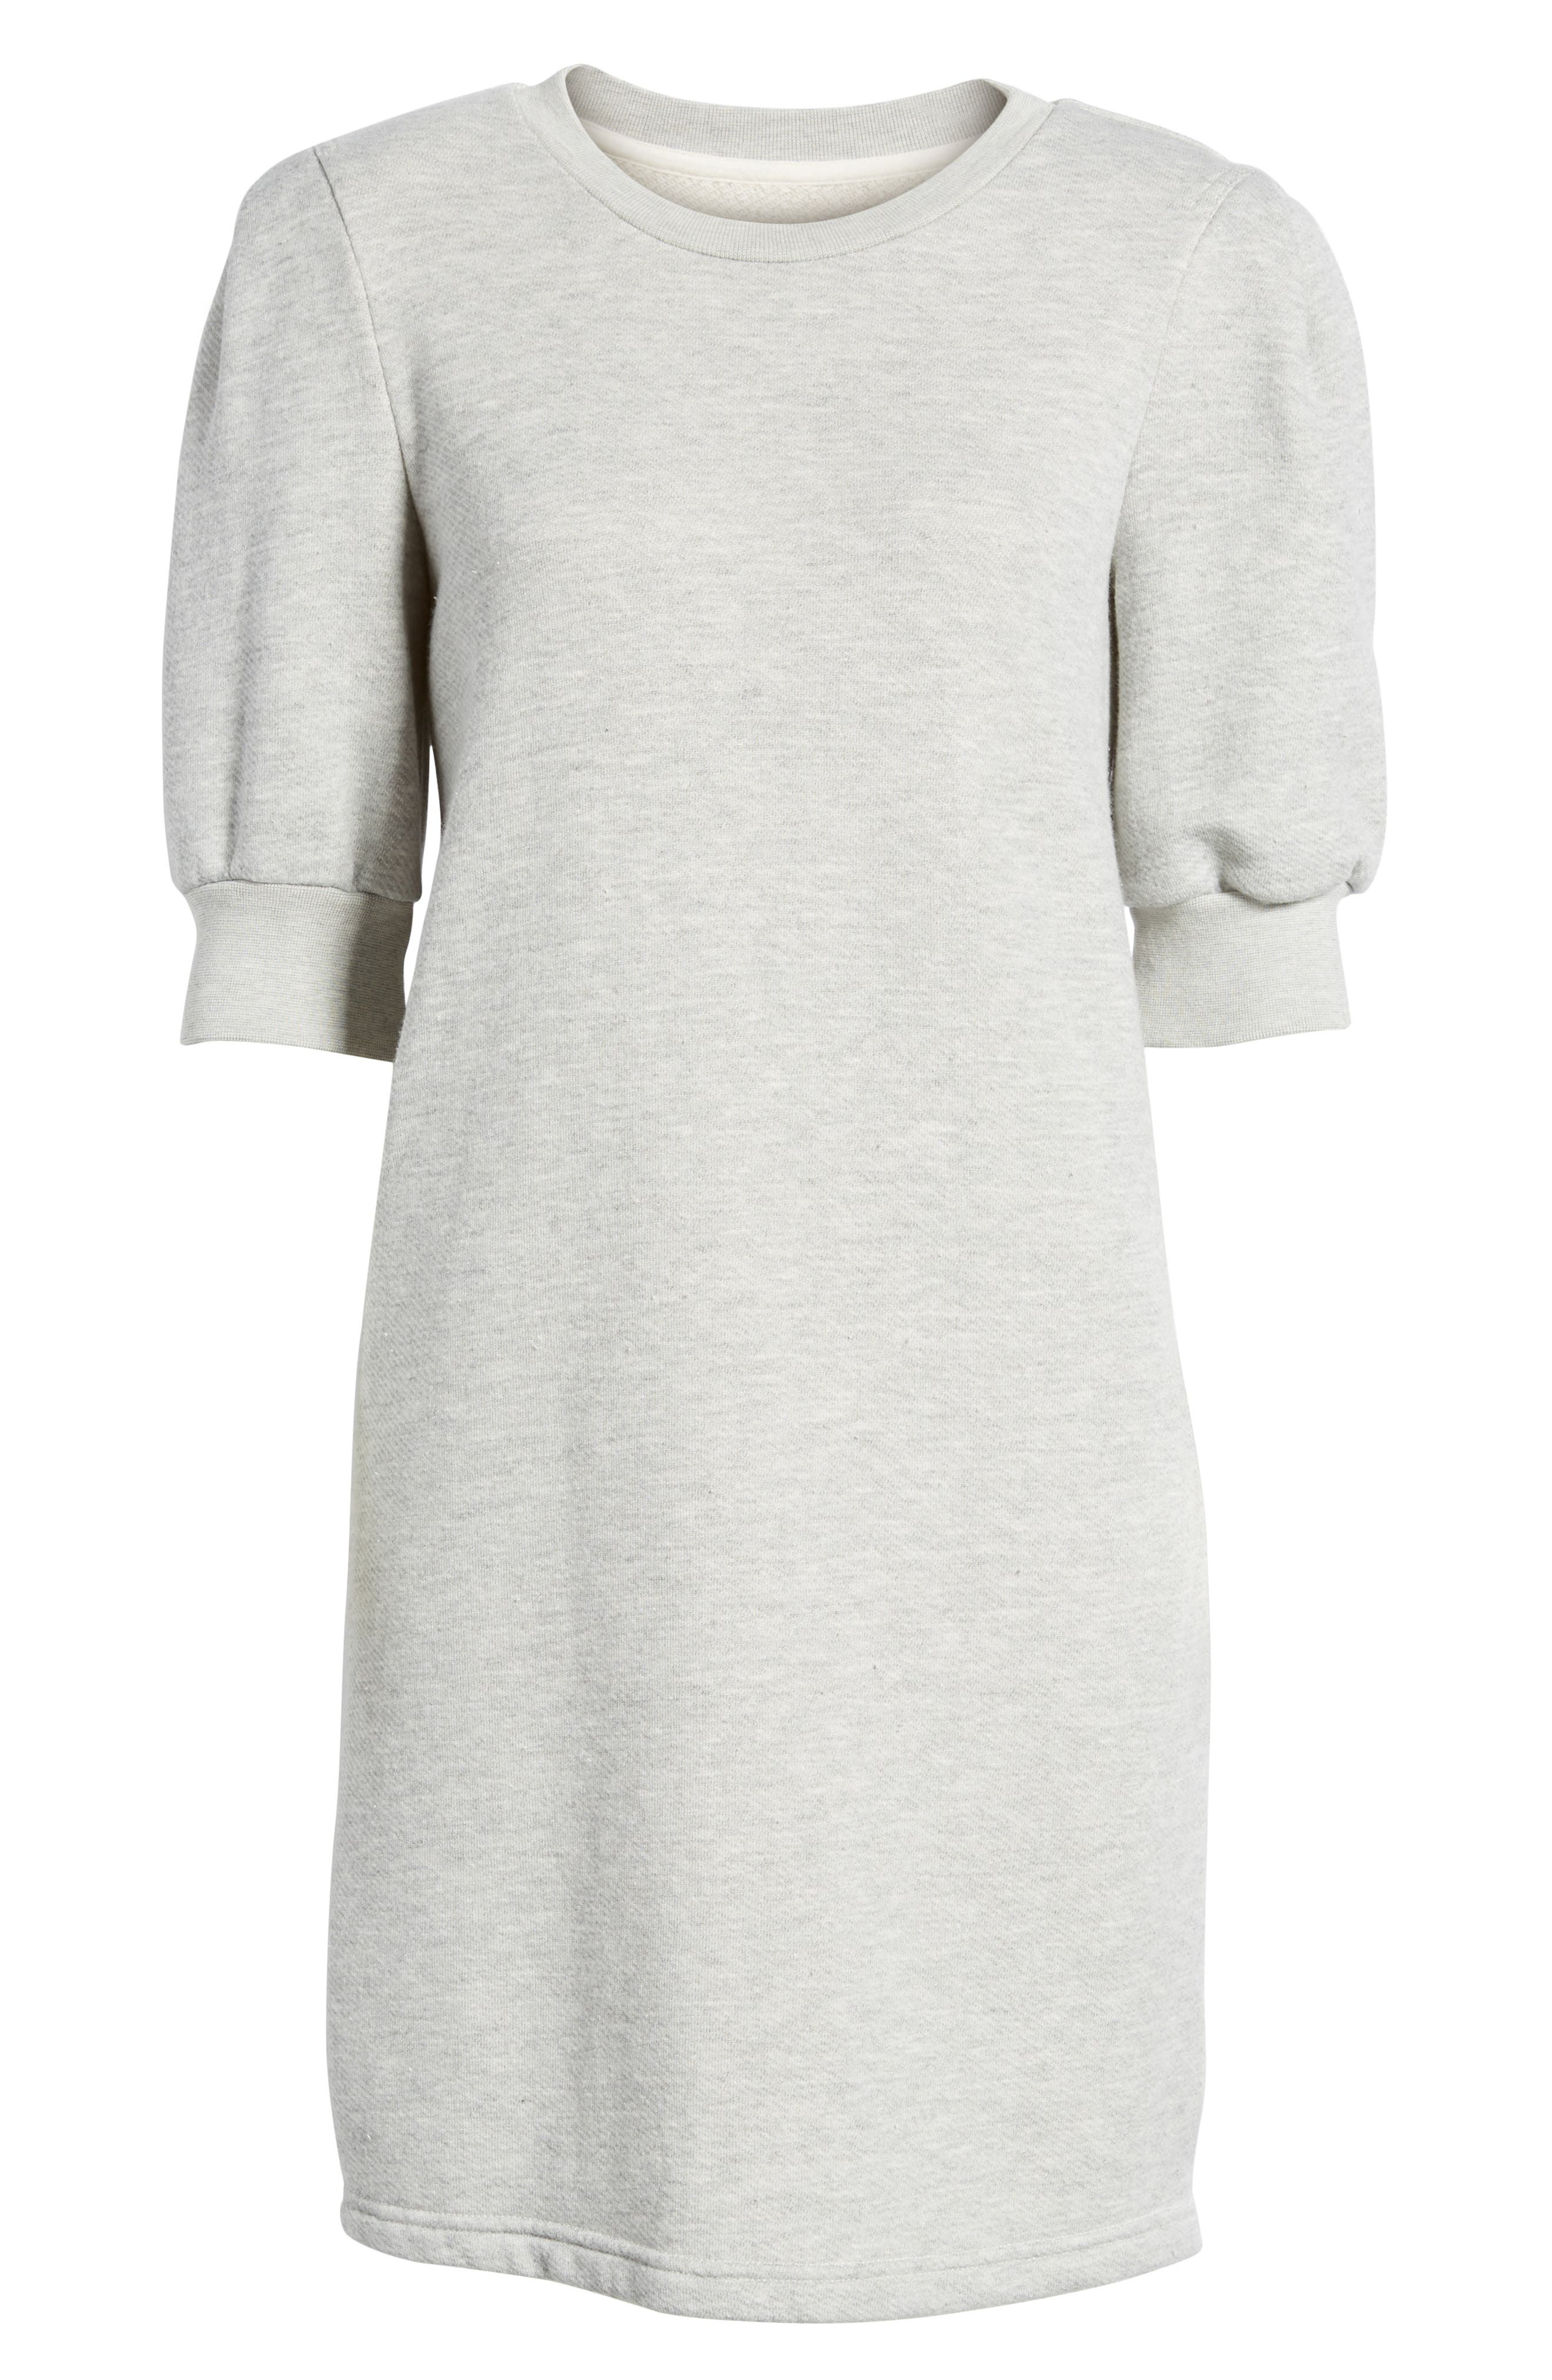 The Pleat Sweatshirt Dress,                             Alternate thumbnail 6, color,                             Light Heather Grey Terry